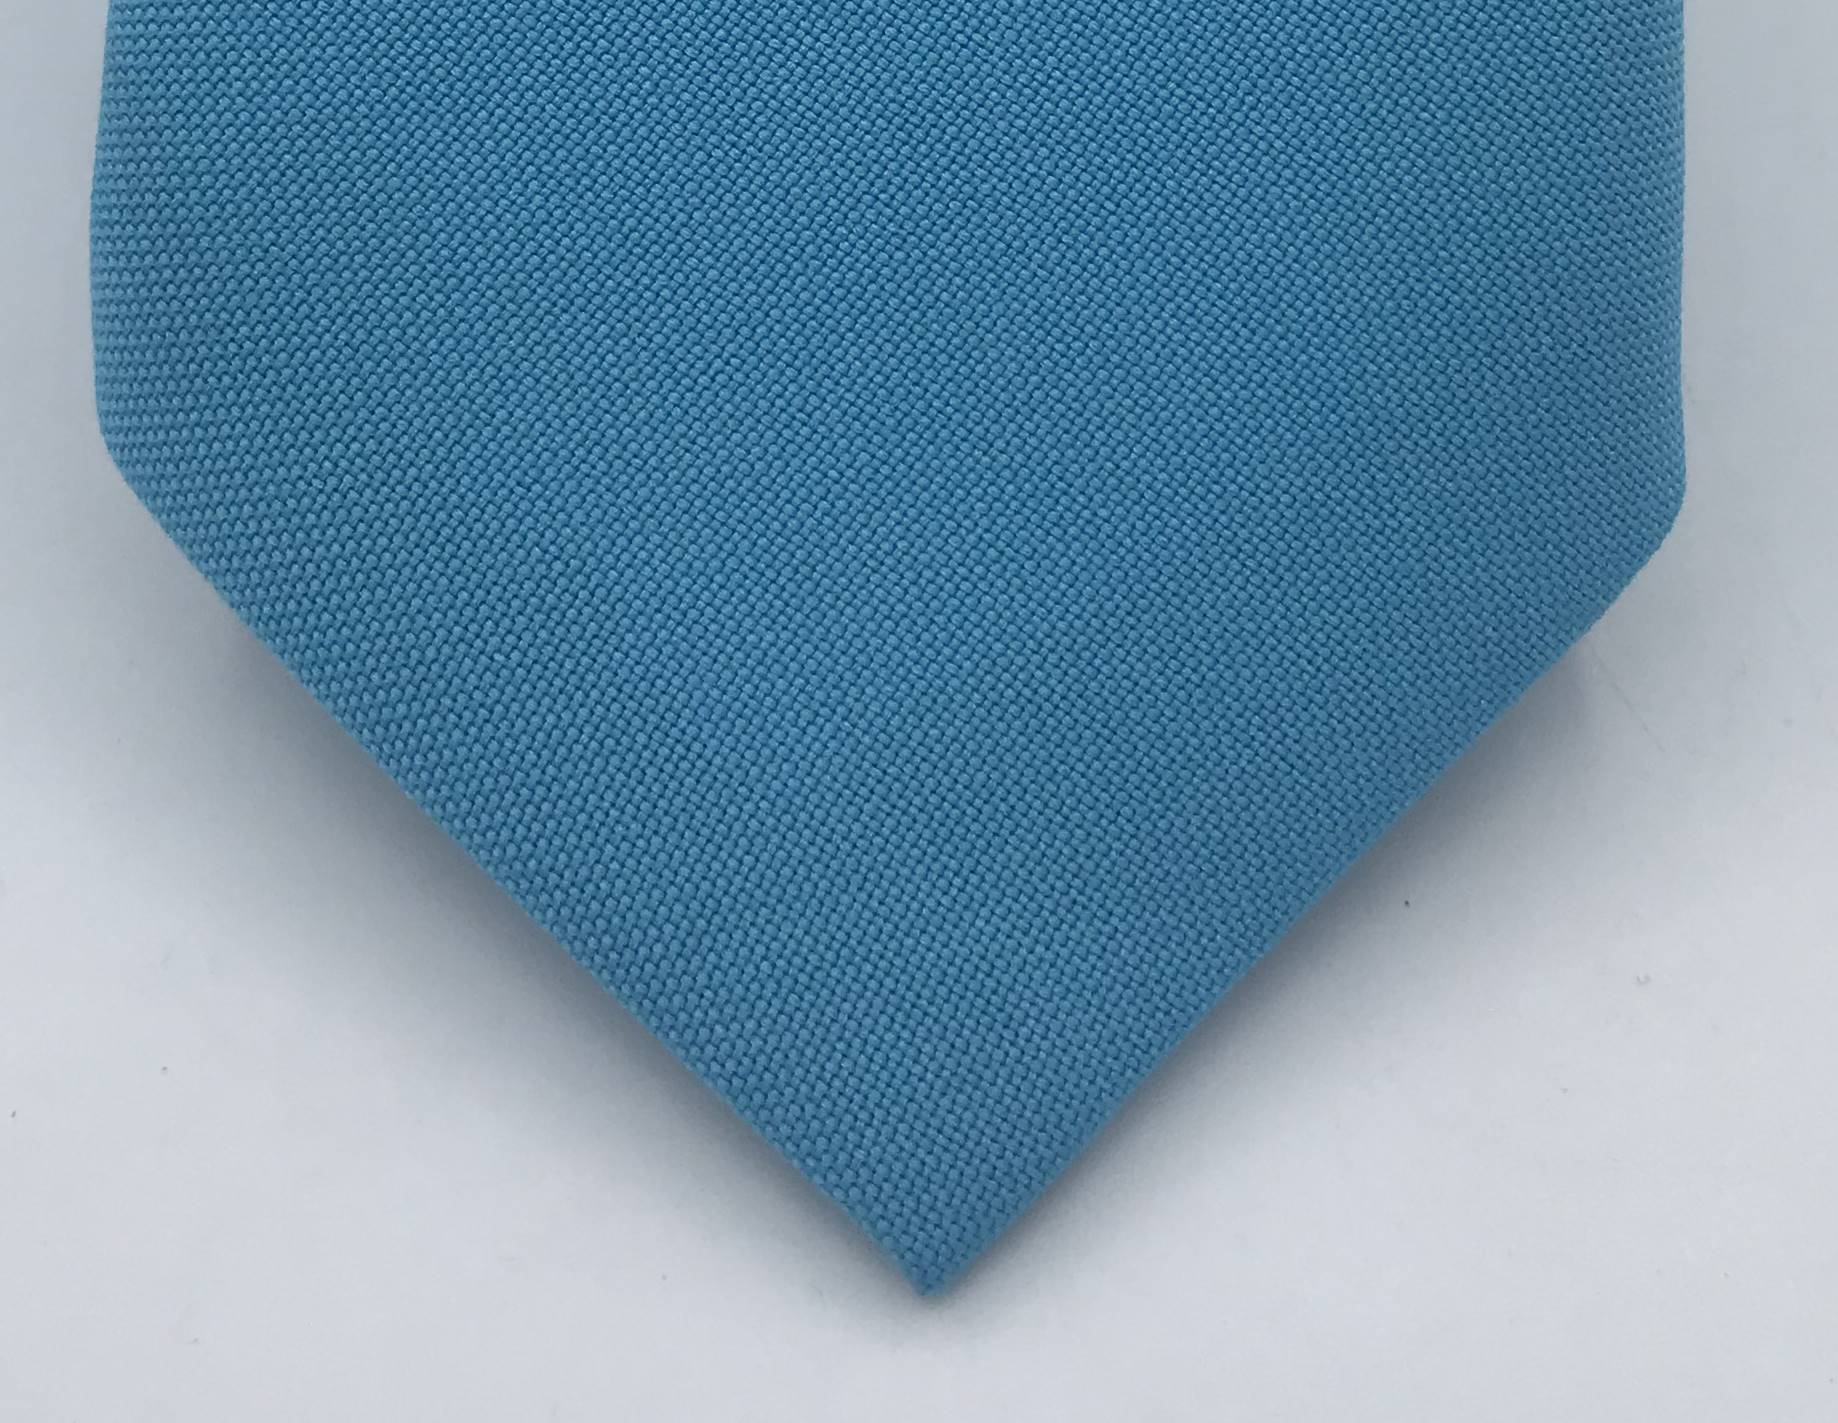 Gravata Azul Tiffany Lisa Fosca